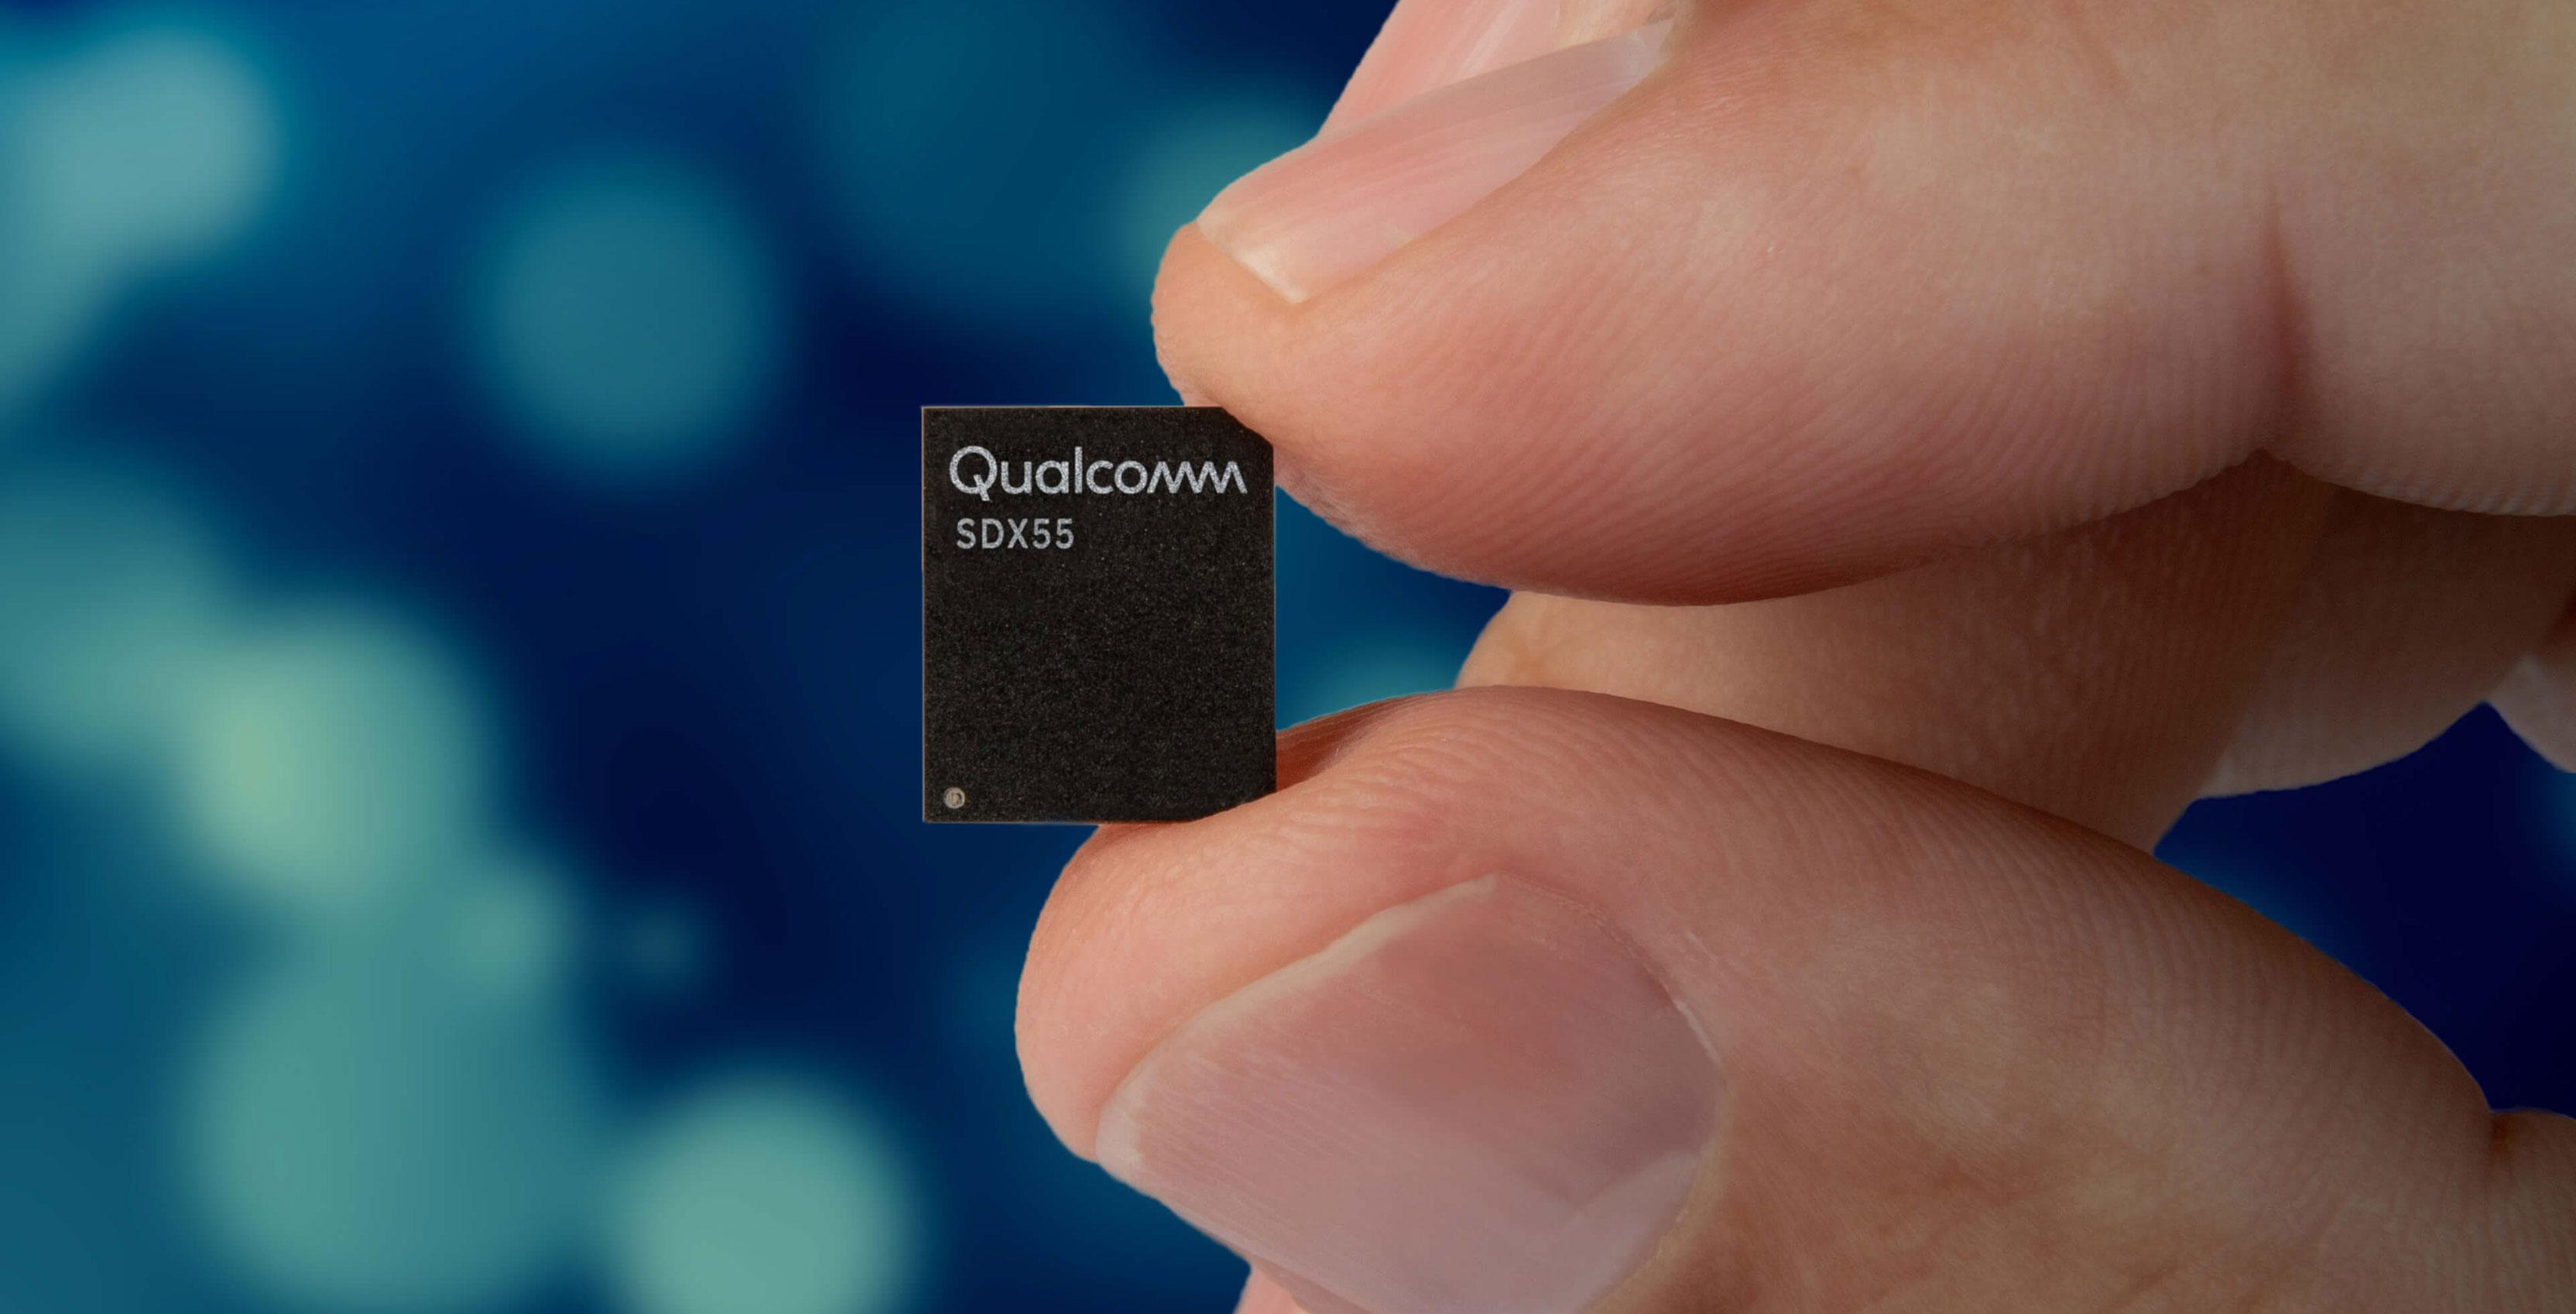 Qualcomm's new X55 modem